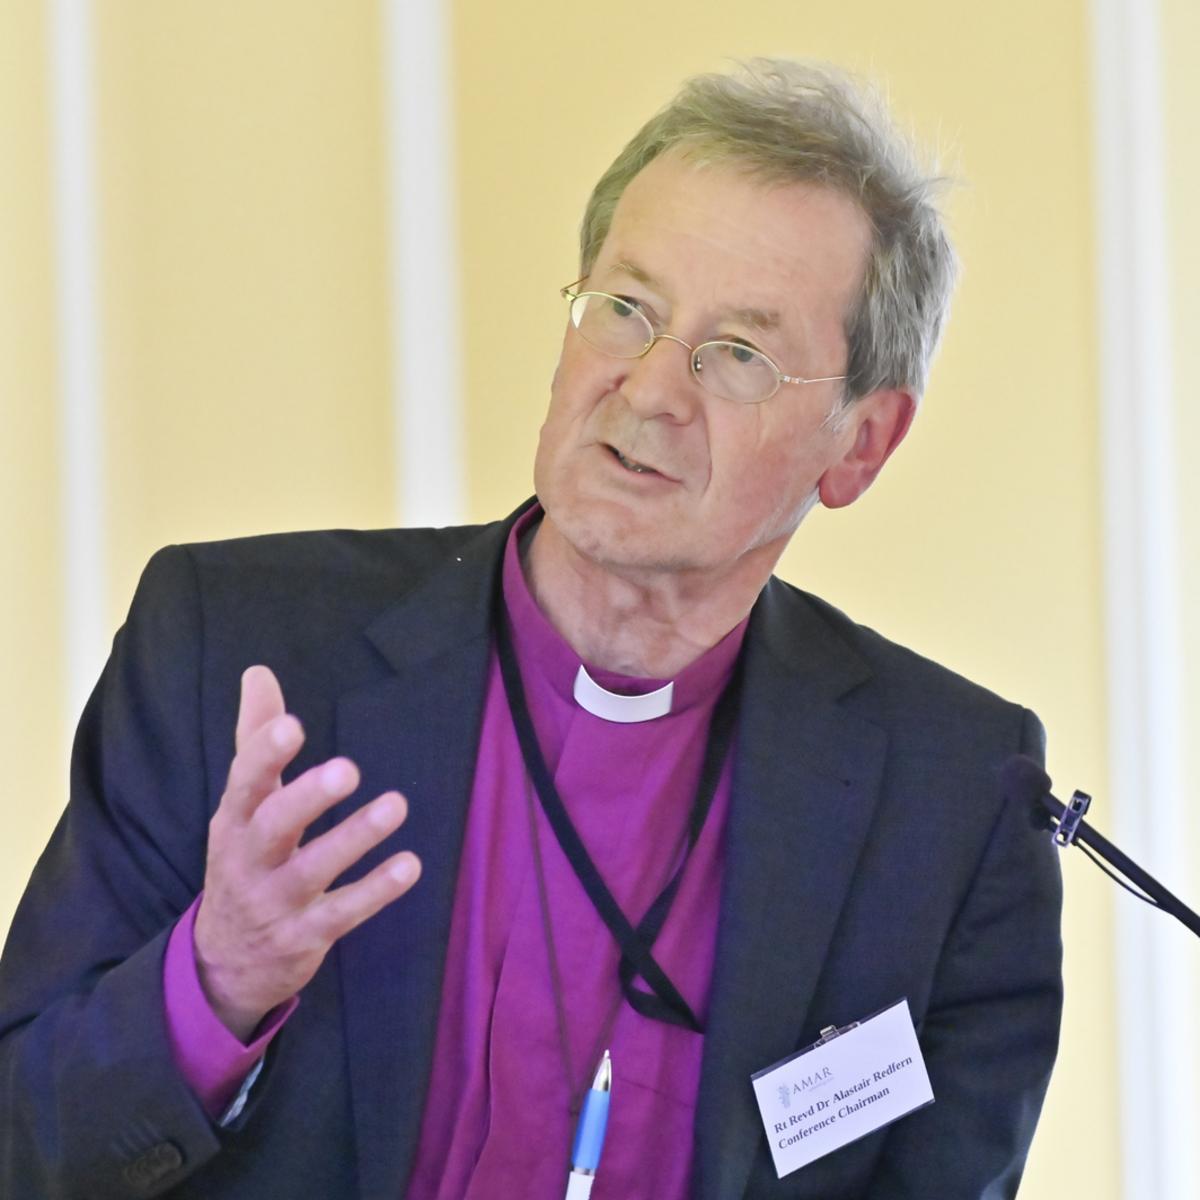 Ctihodný reverend Dr. Alastair Redfern sa prihovára na konferencii AMAR Windsor Dialogue Conference